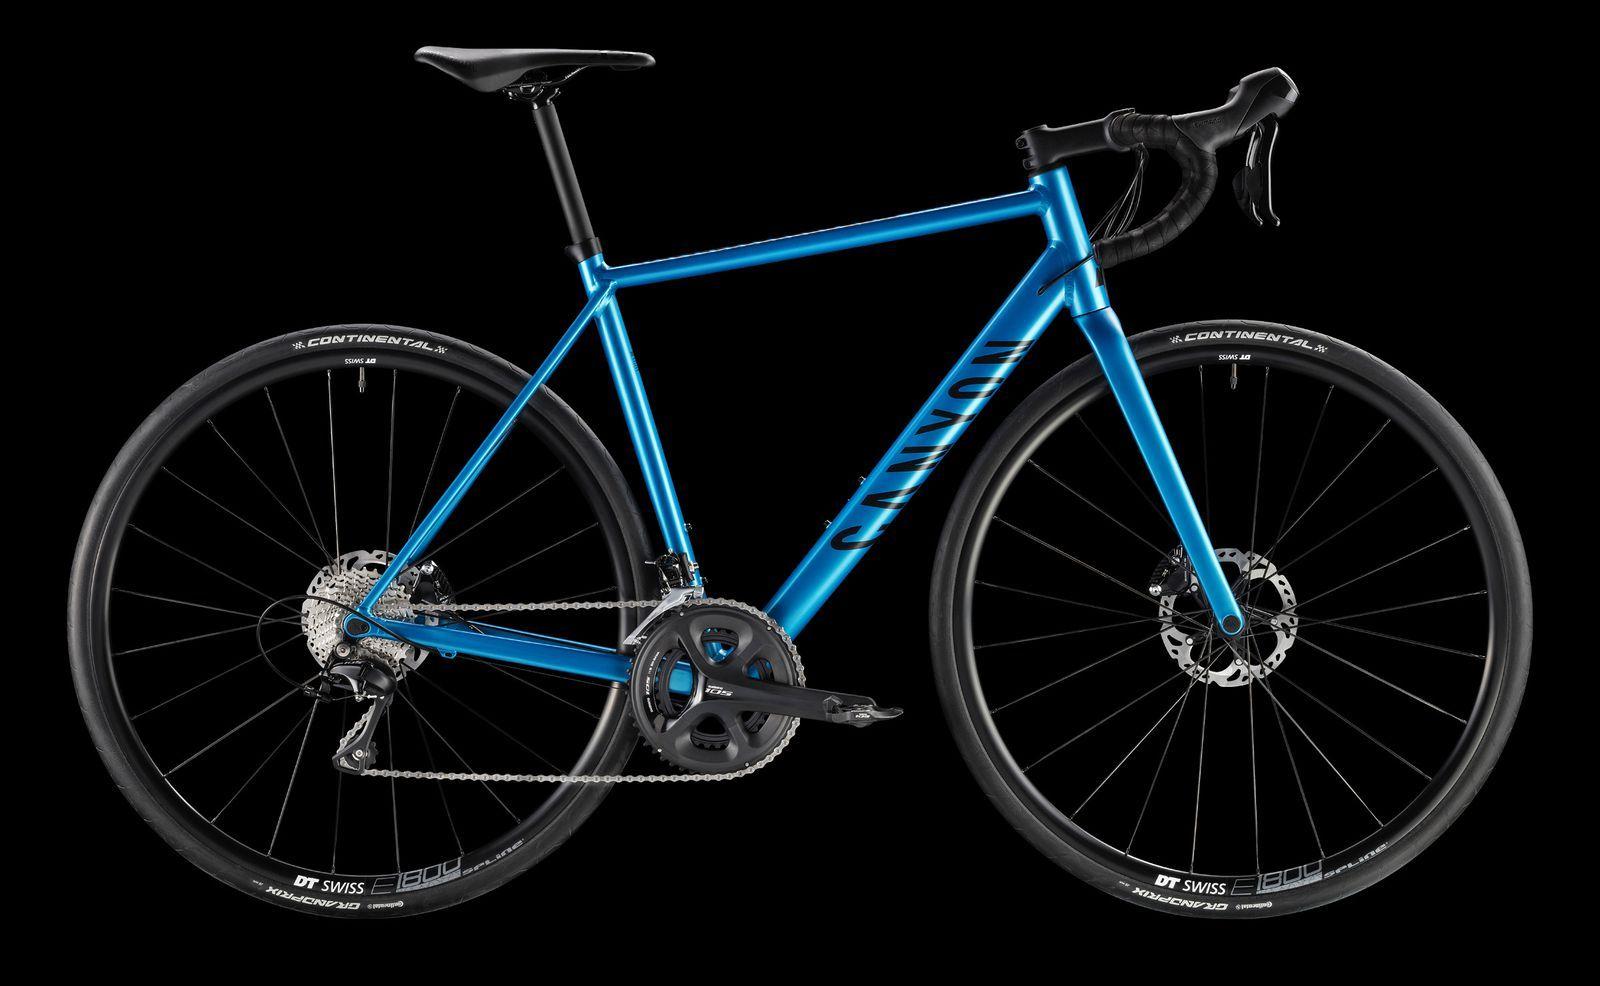 The Canyon Endurace Al Disc Redefines Entry Level Canyon Bike